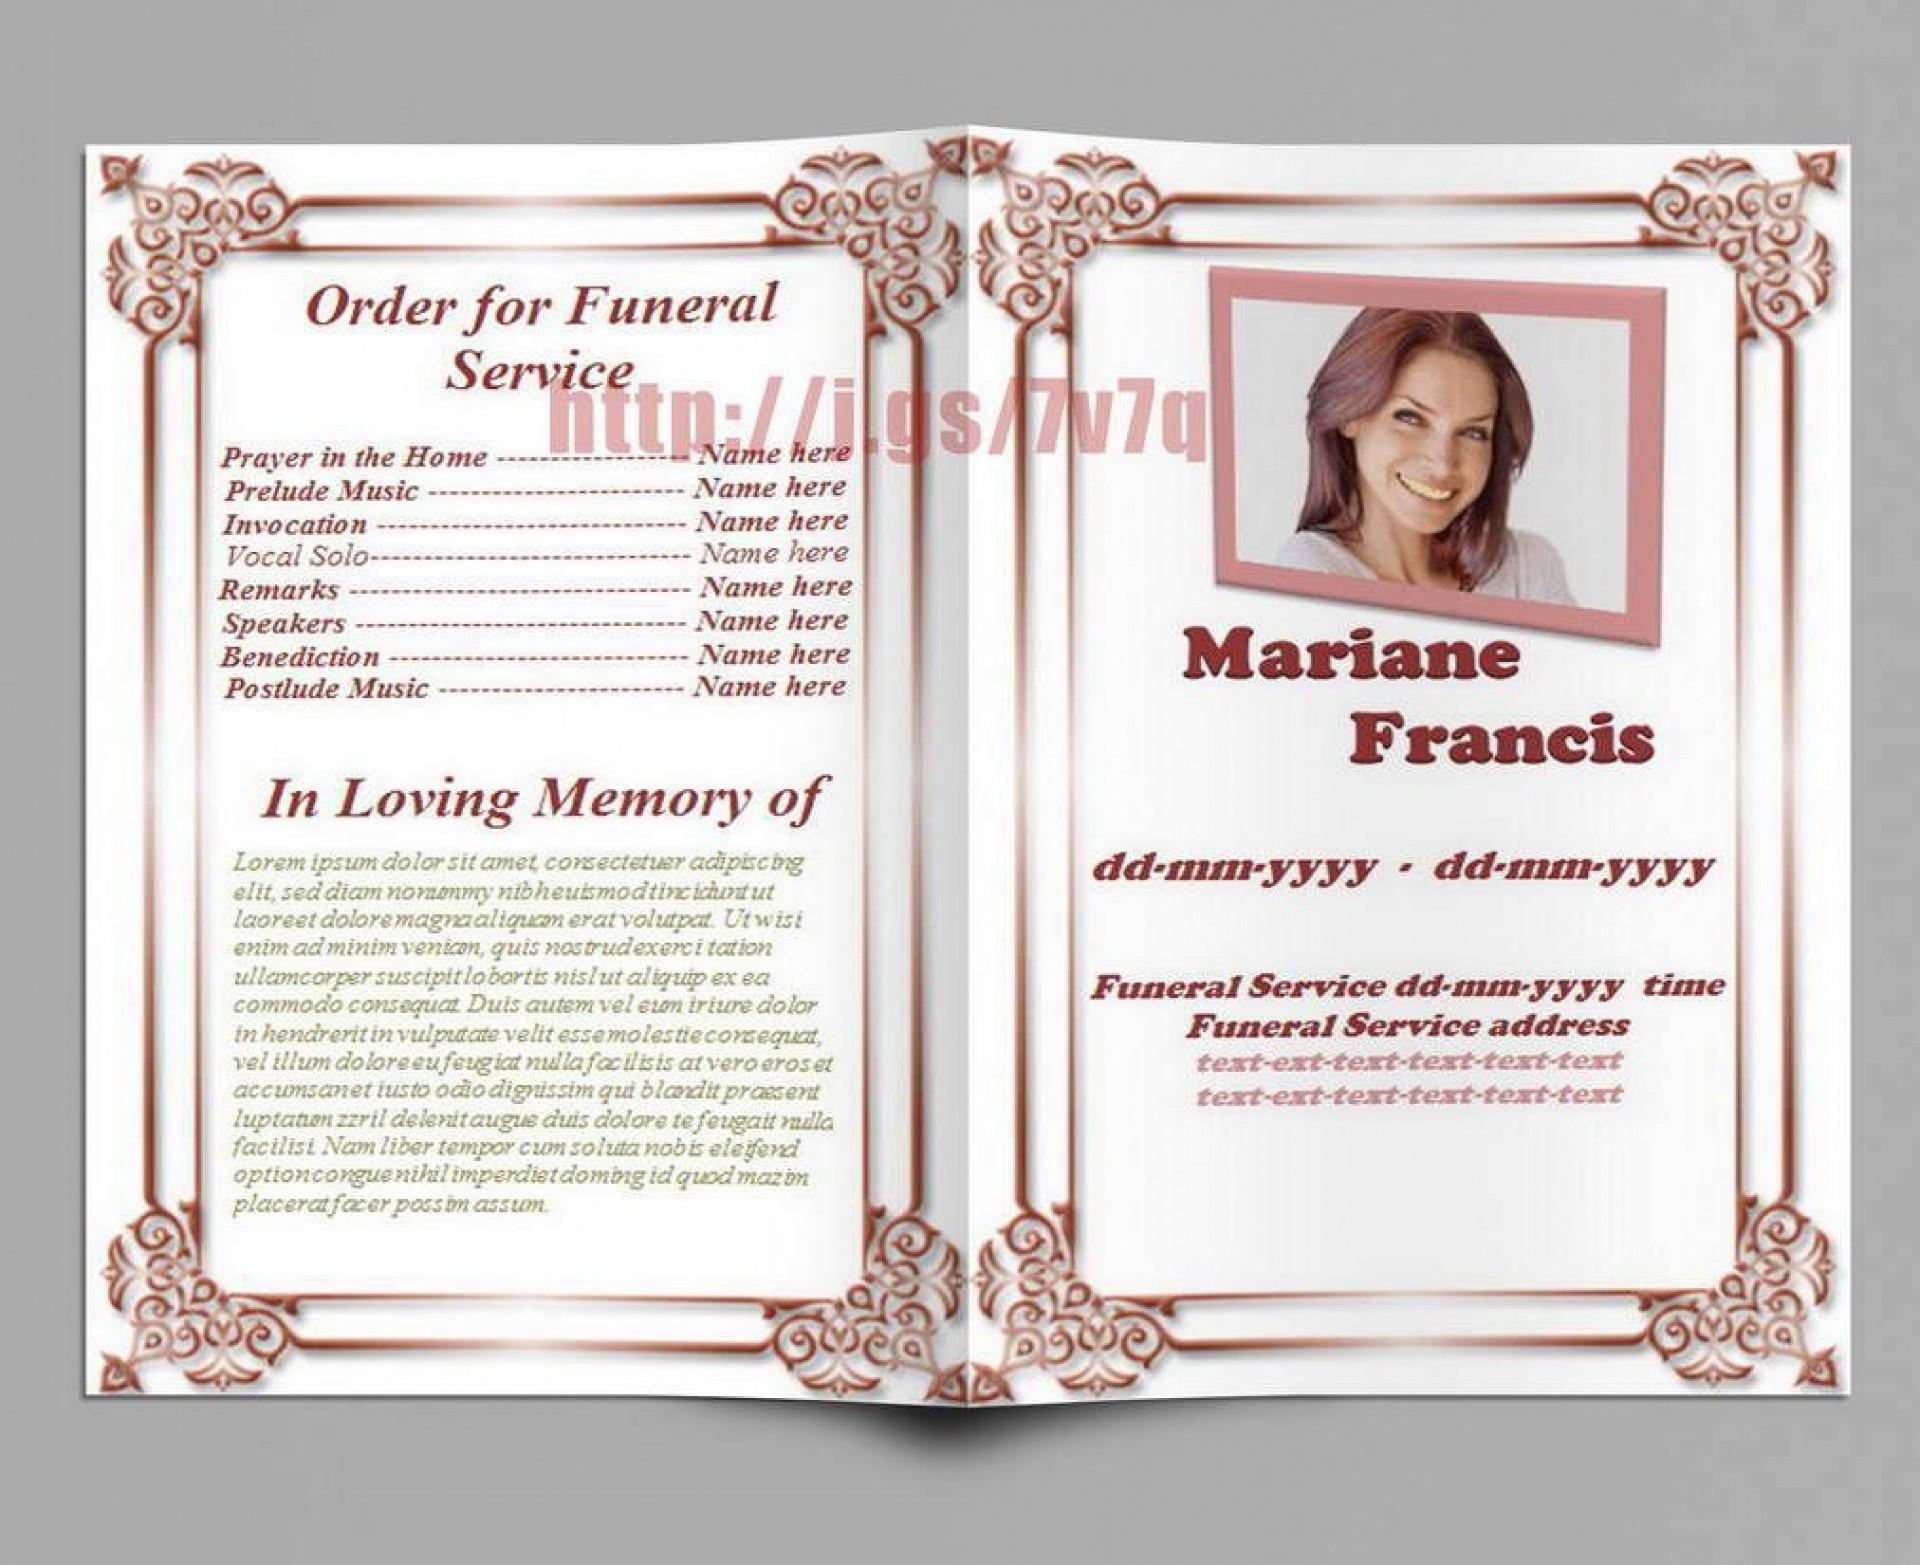 004 Shocking Template For Funeral Programme High Resolution  Sample Mas Program Word1920